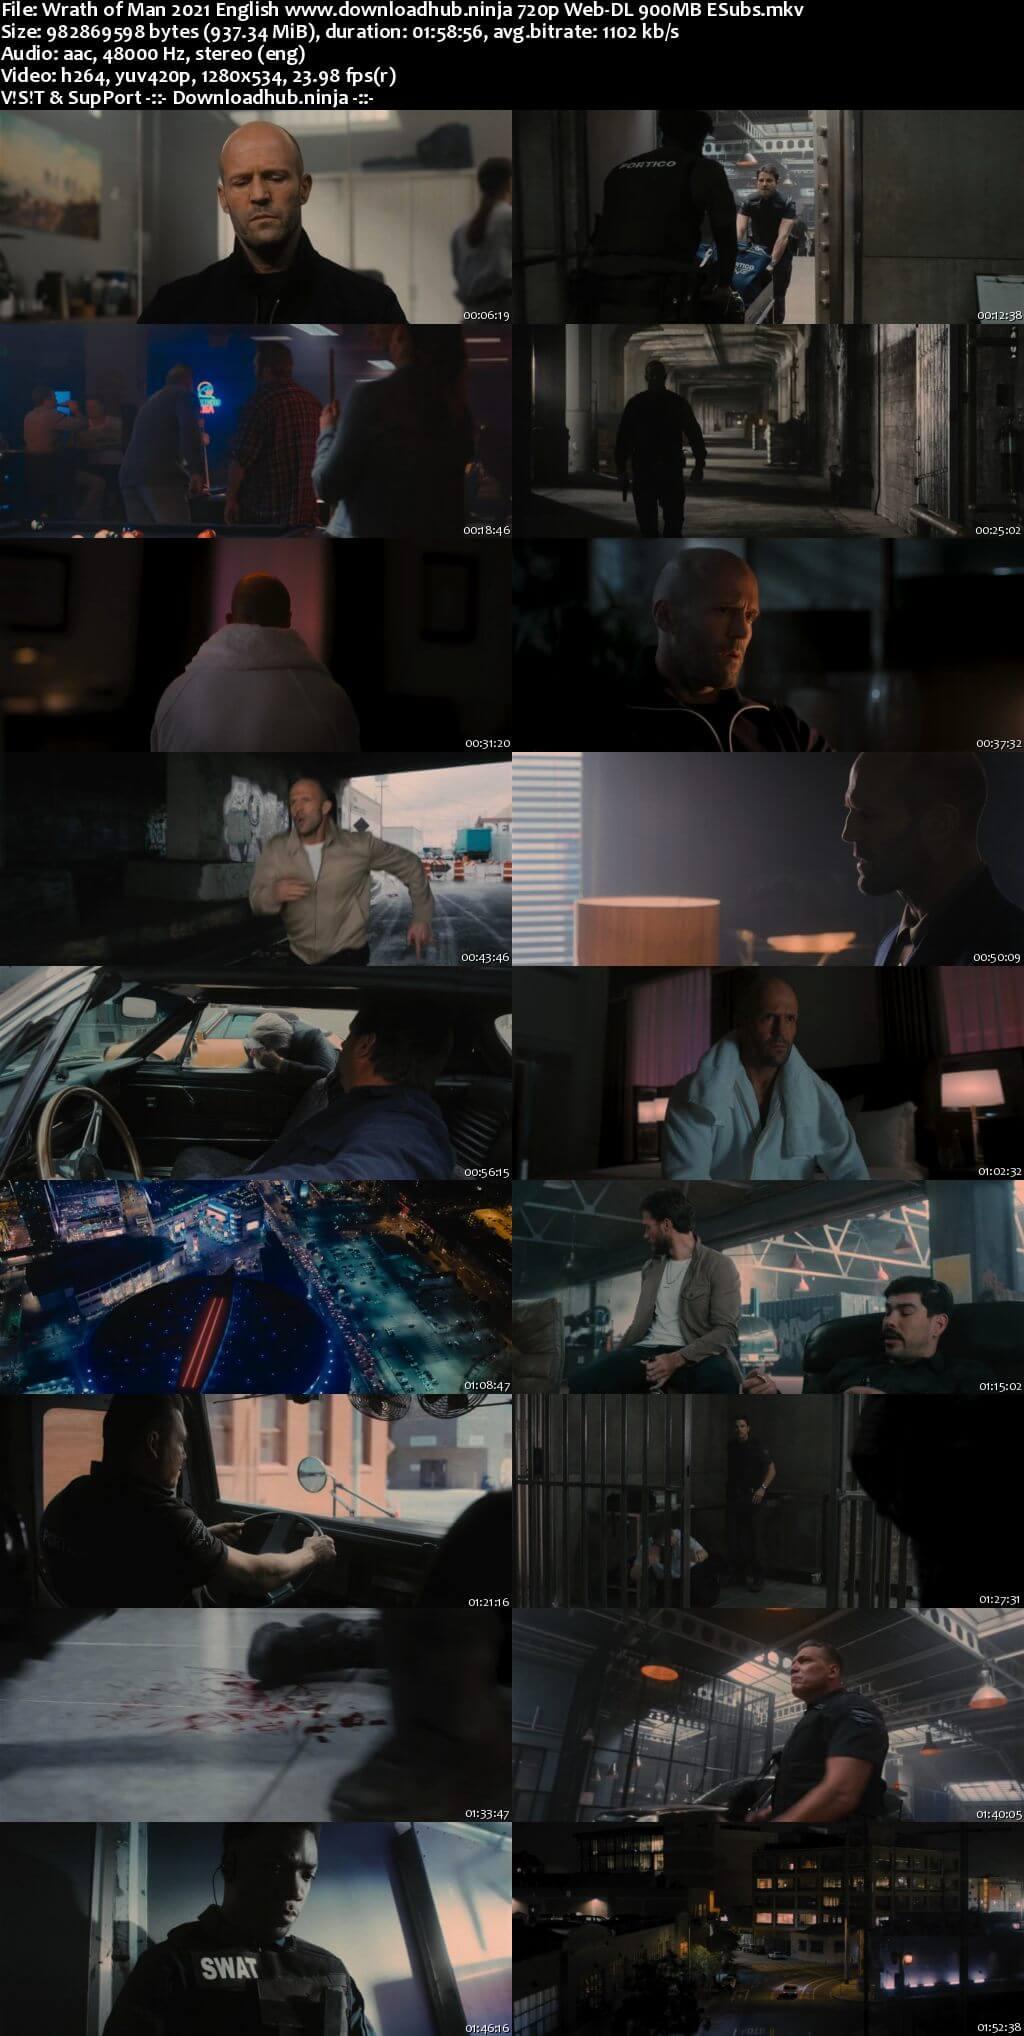 Wrath of Man 2021 English 720p Web-DL 900MB ESubs